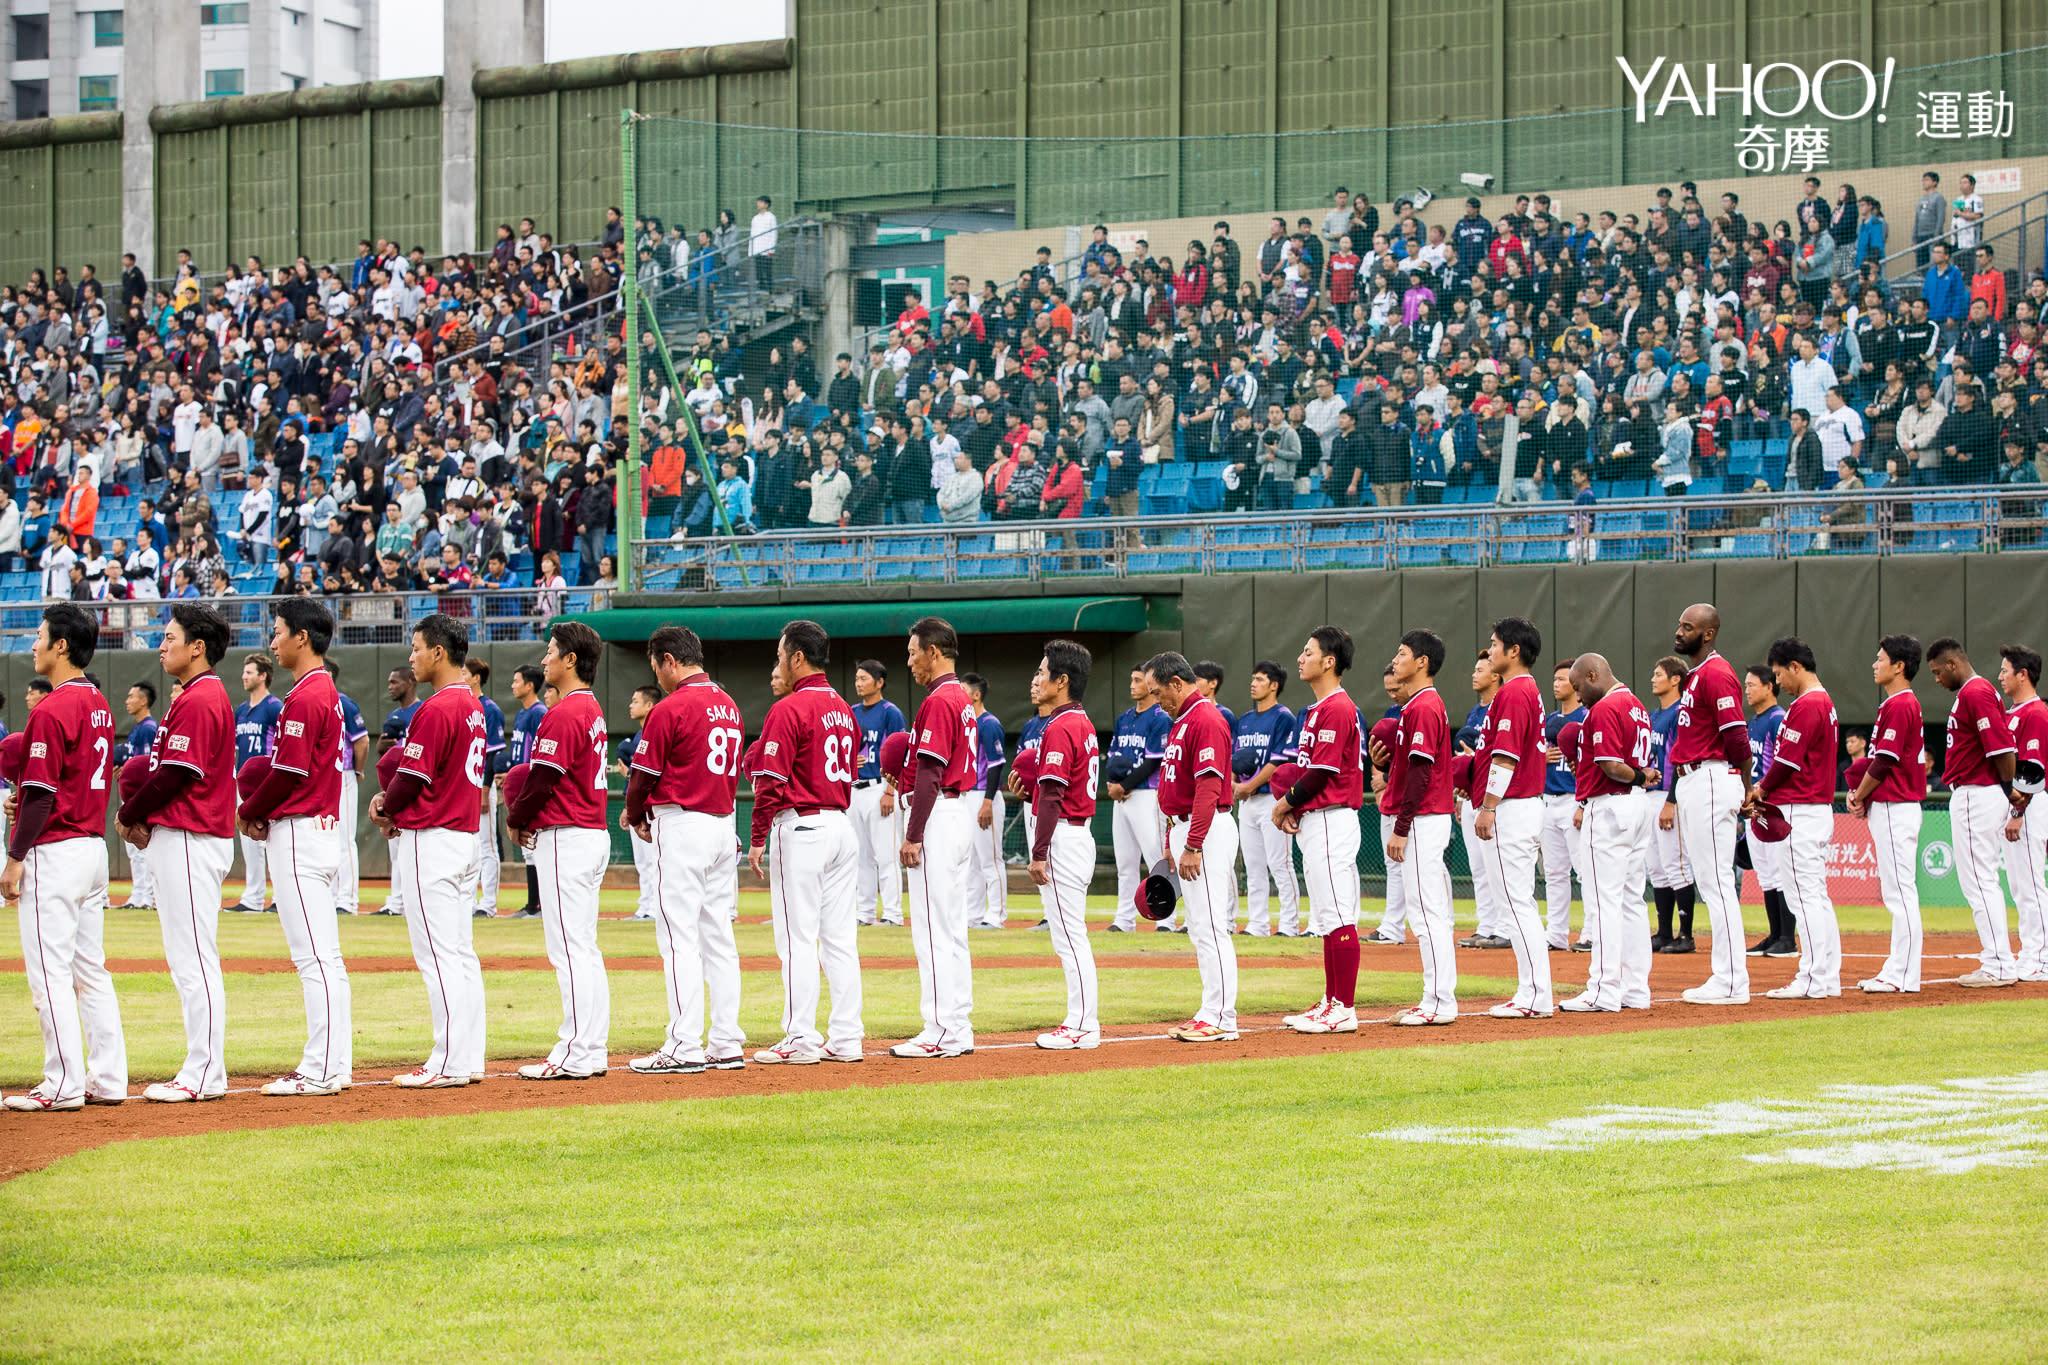 Lamigo桃猿將變身為樂天棒球隊,你怎麼看?